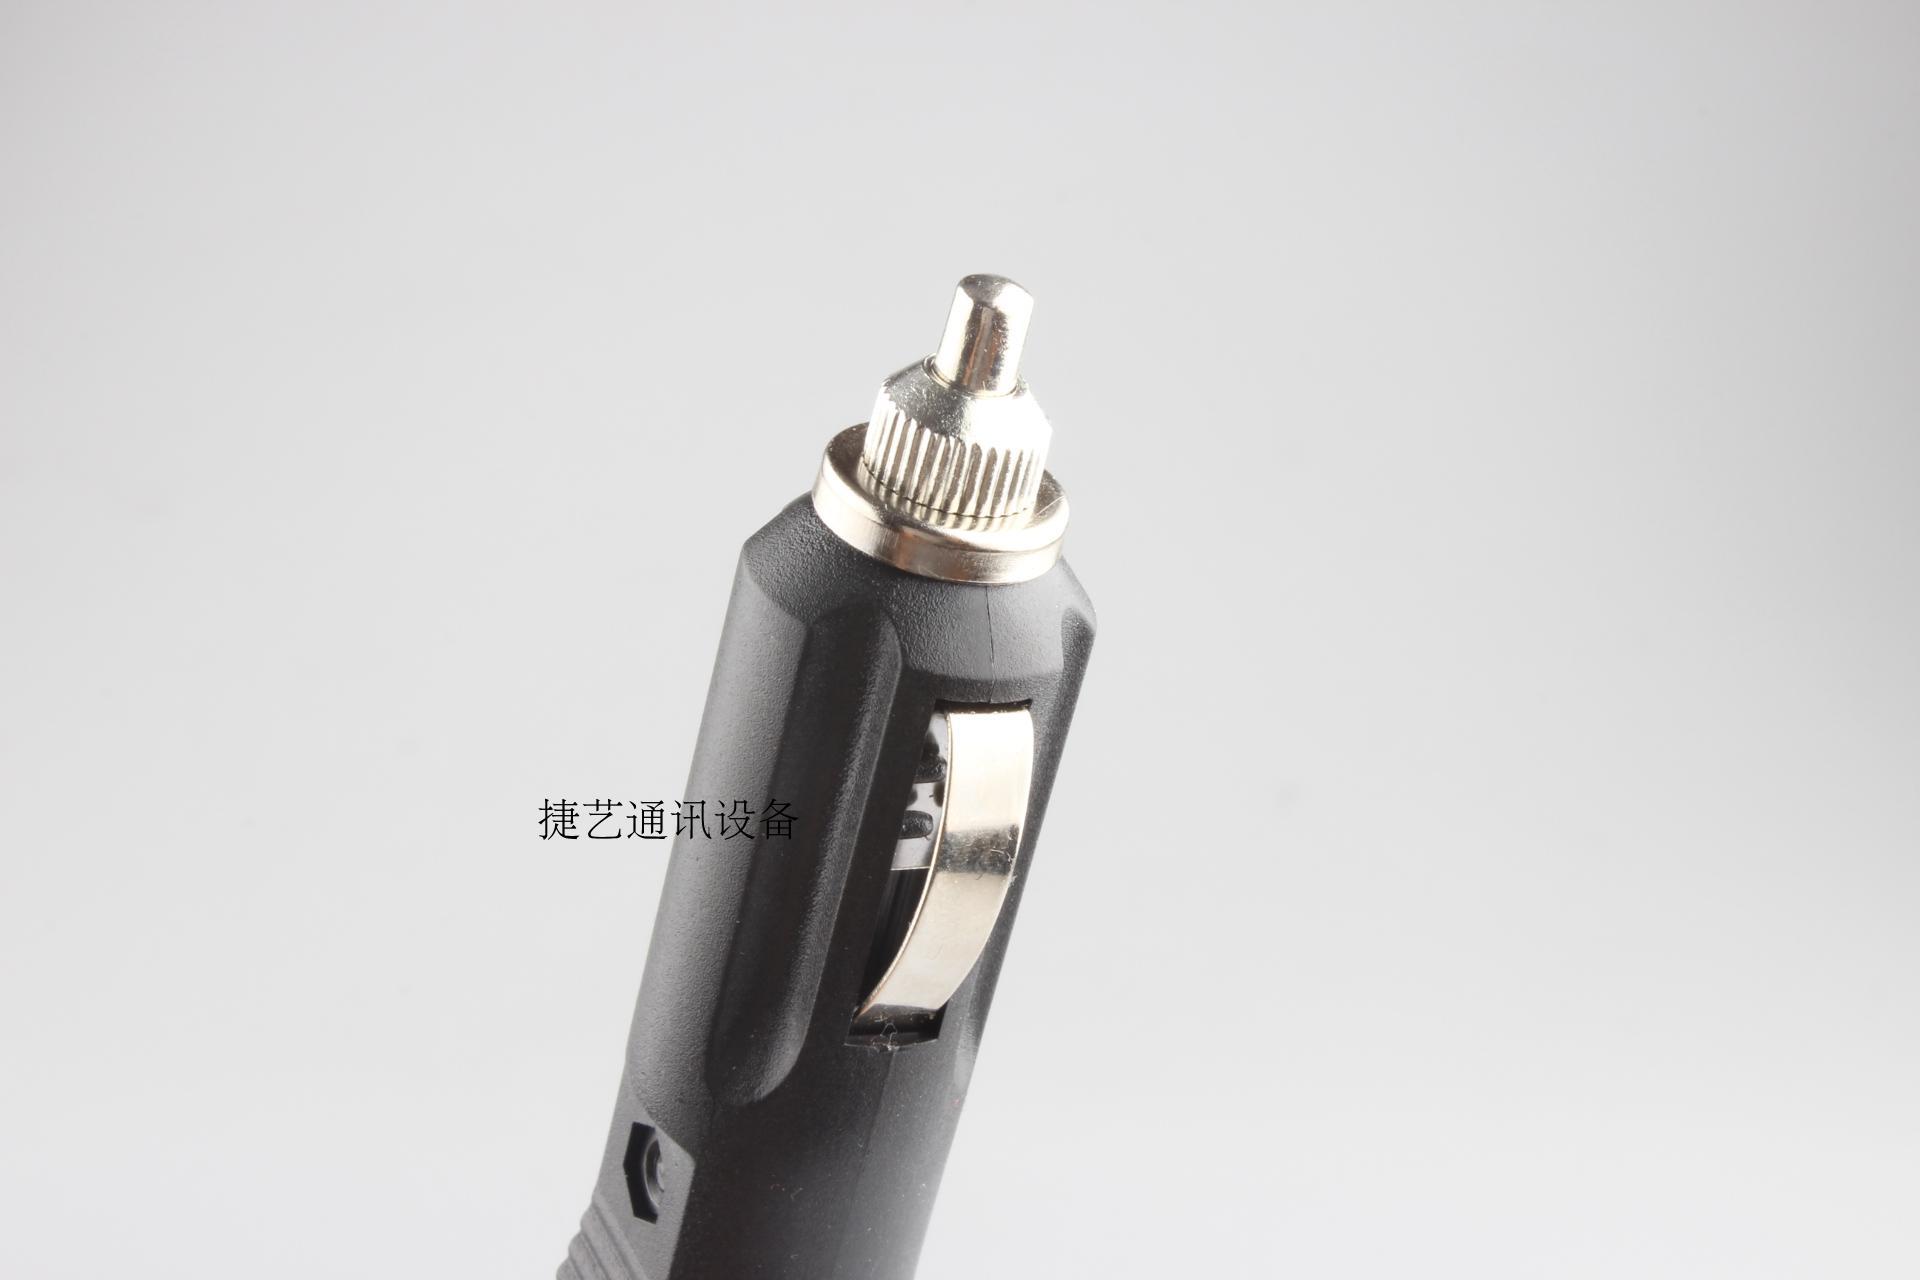 MOTO Motorola car charger SMP318/418/458/468/818/528 walkie-talkie car charger charging 12V